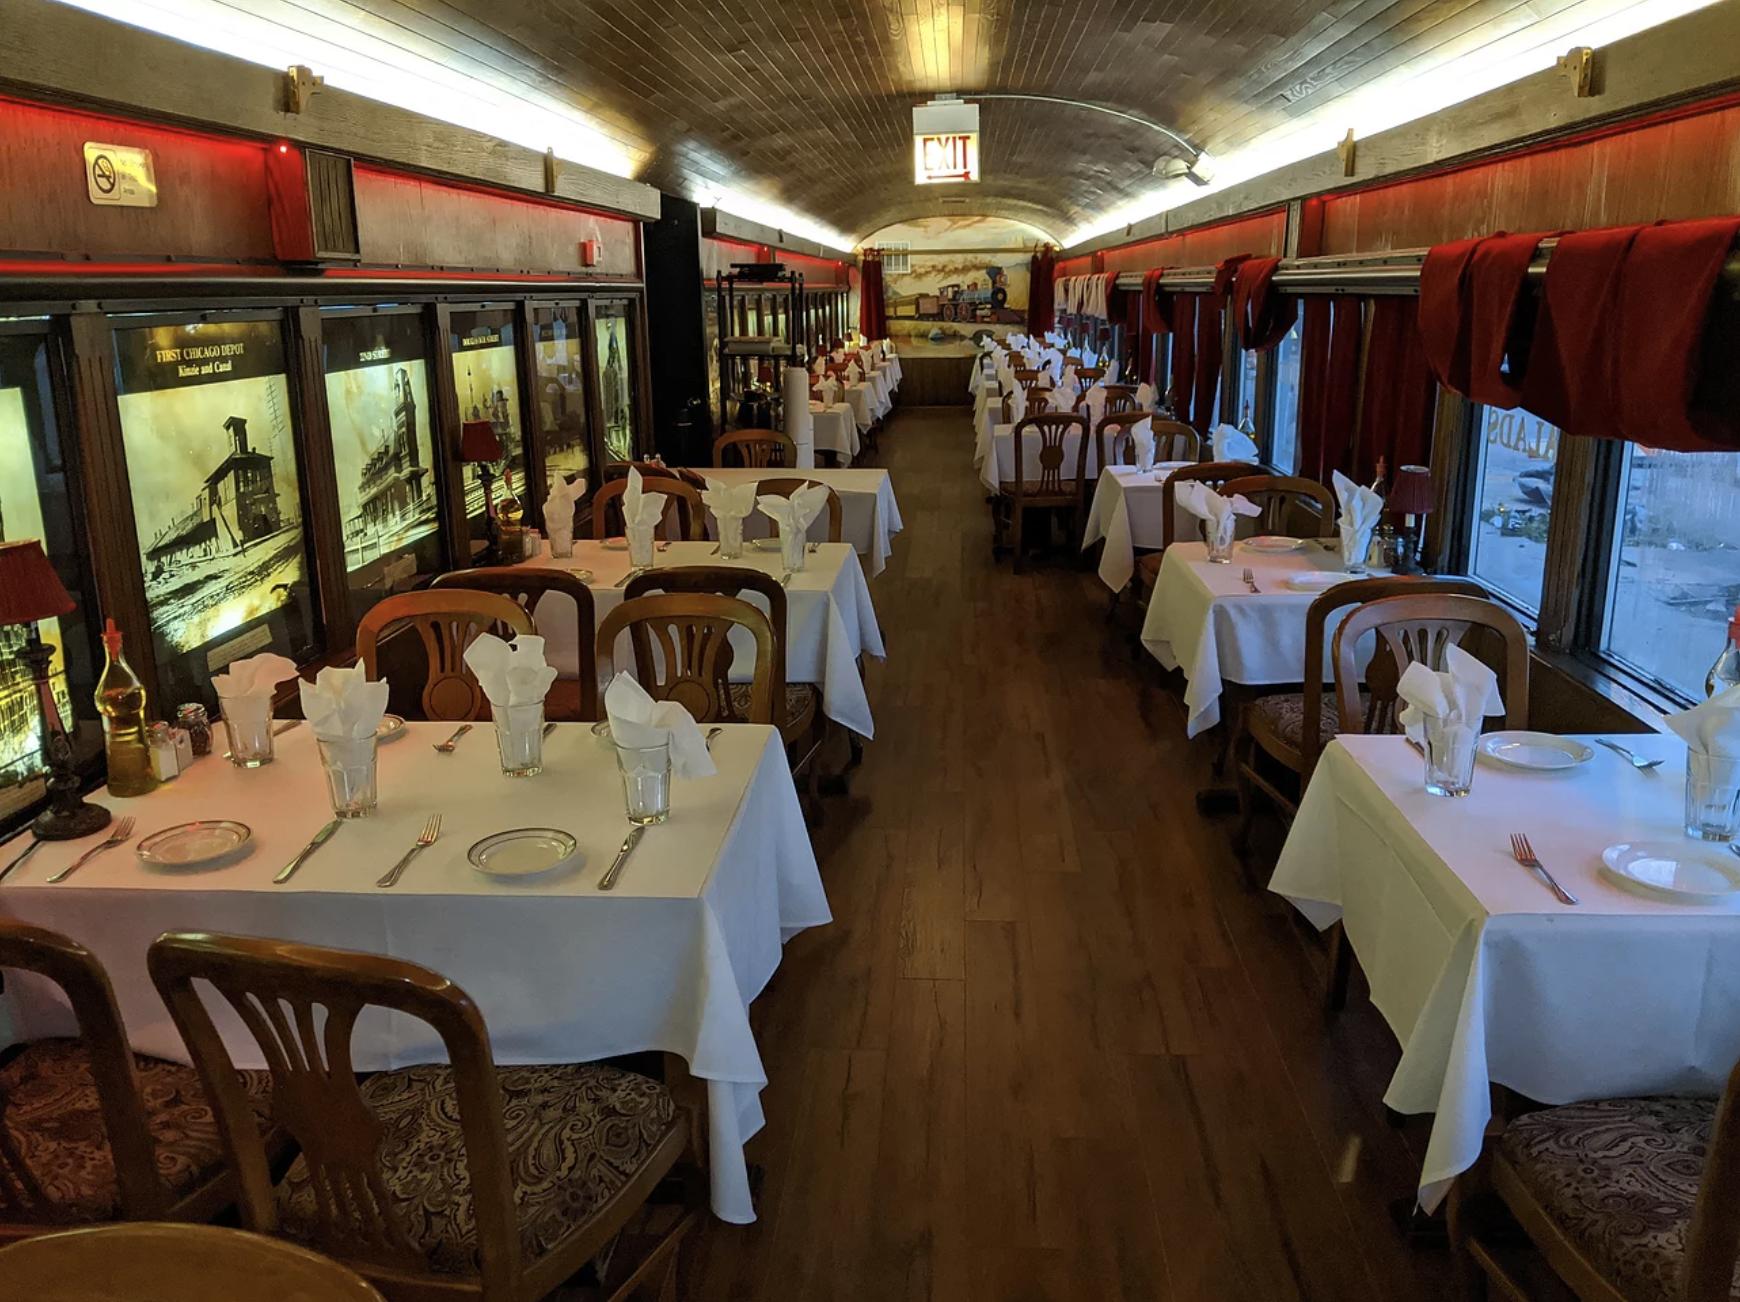 A dining room inside a narrow train car.